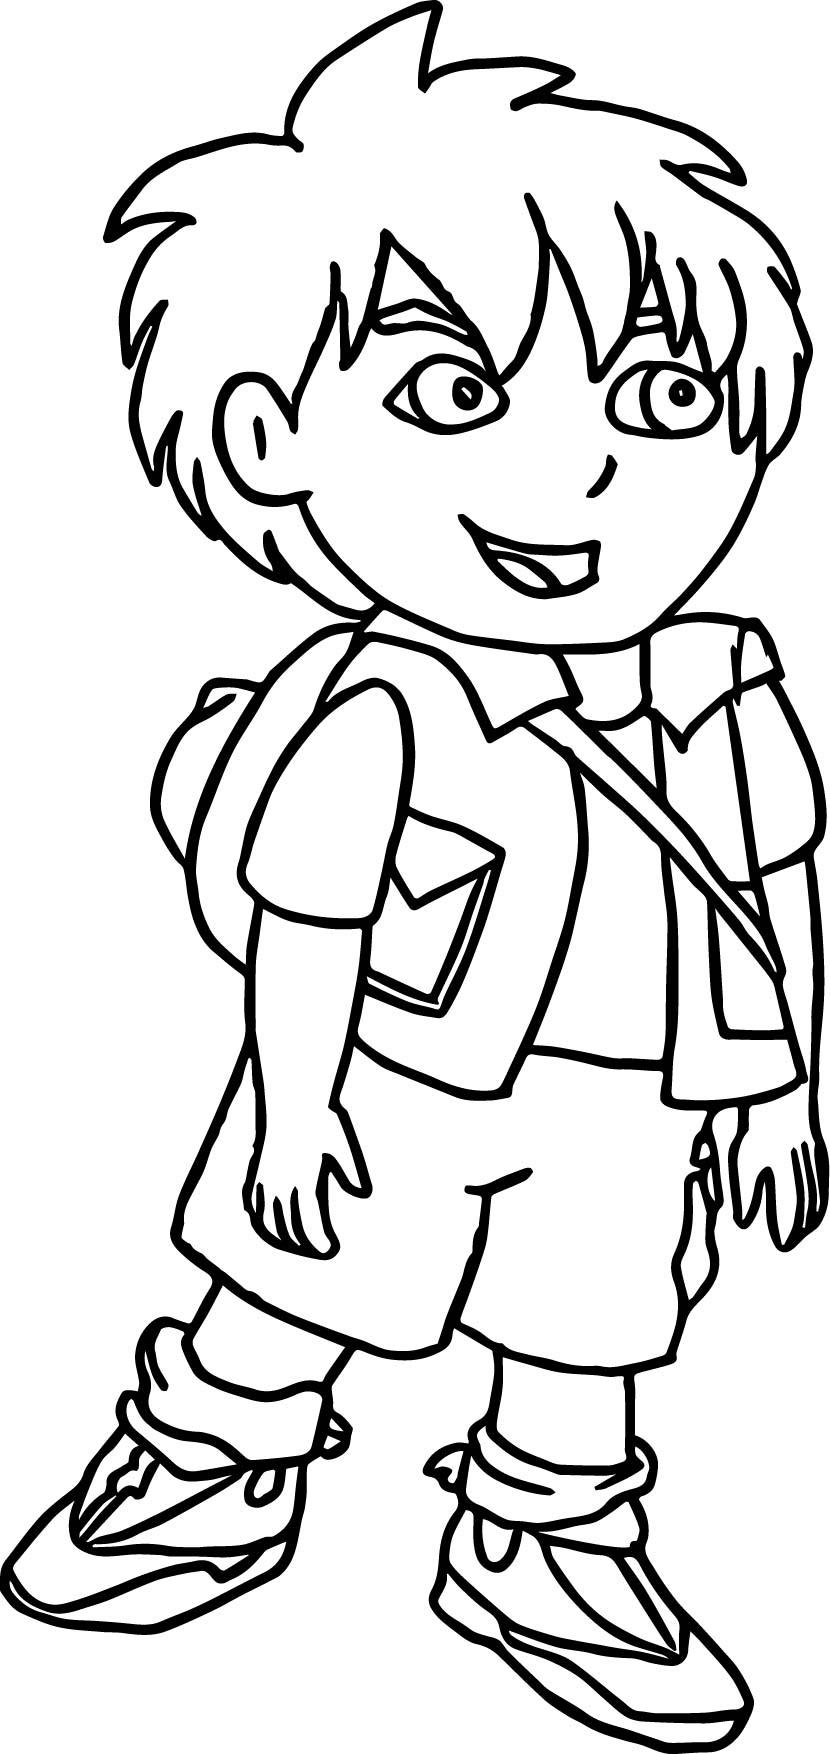 Good Go Diego Go Coloring Page Wecoloringpage Com